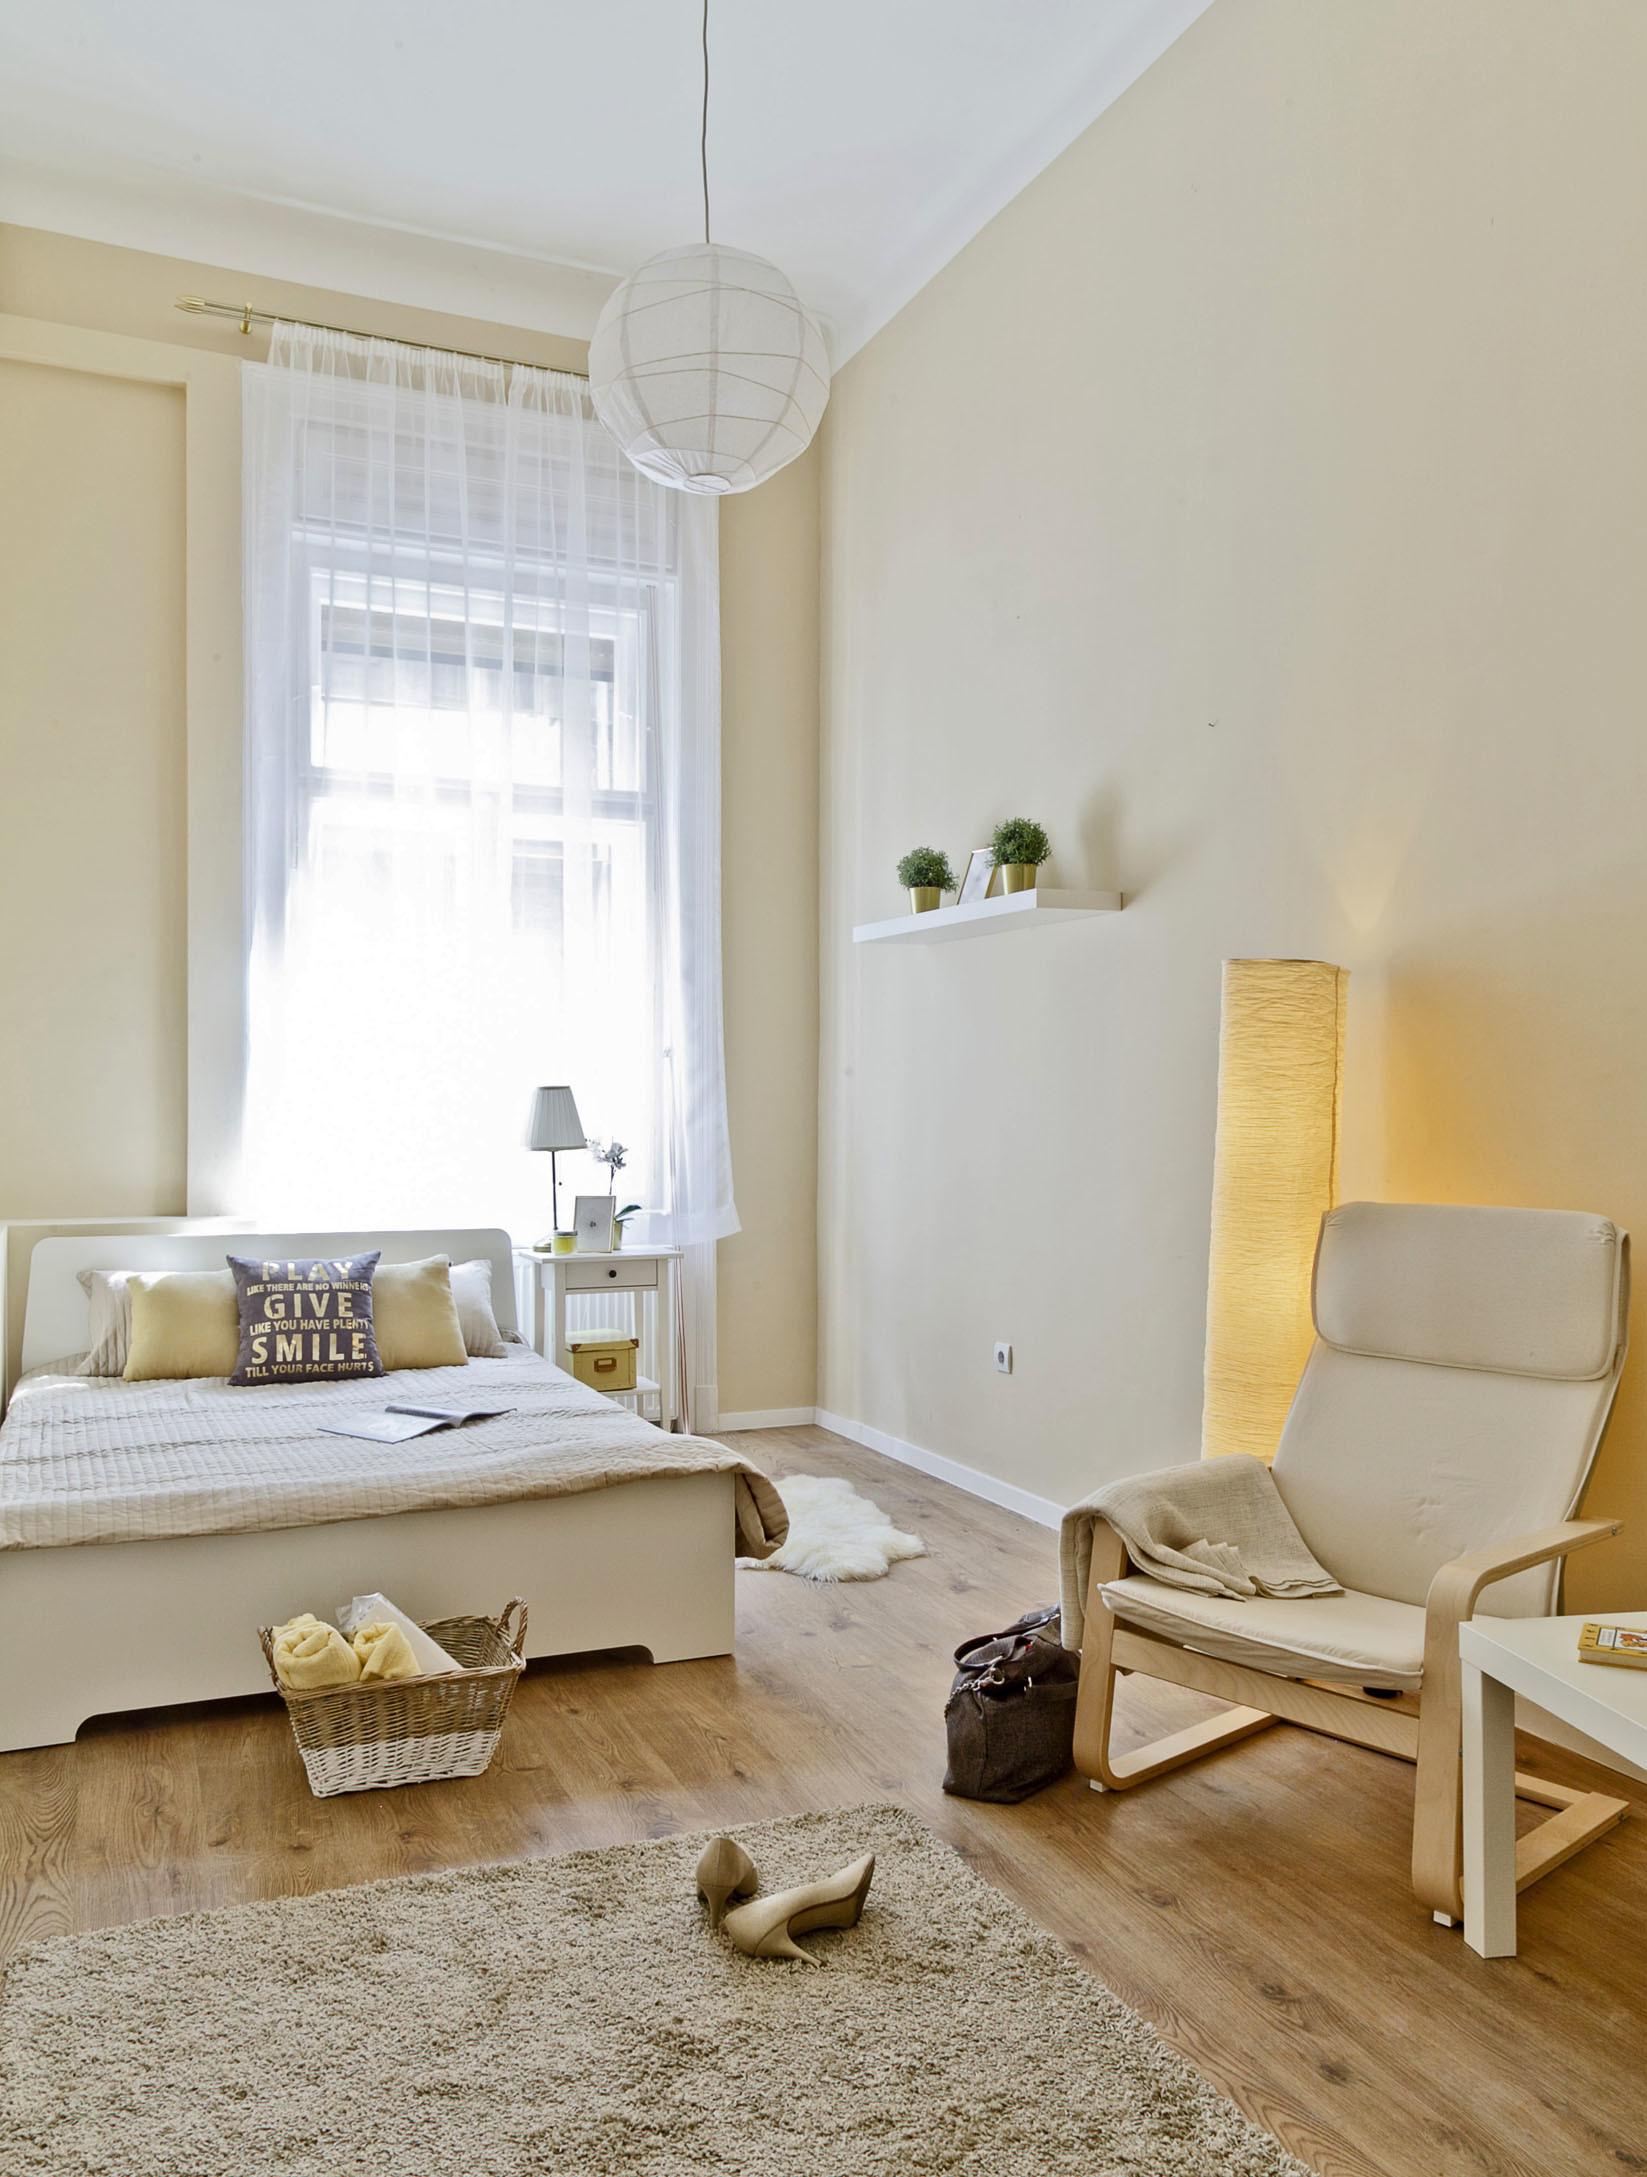 furniture to separate rooms. Cozy Apartment With 4 Separate Rooms In The City Center, Furniture To